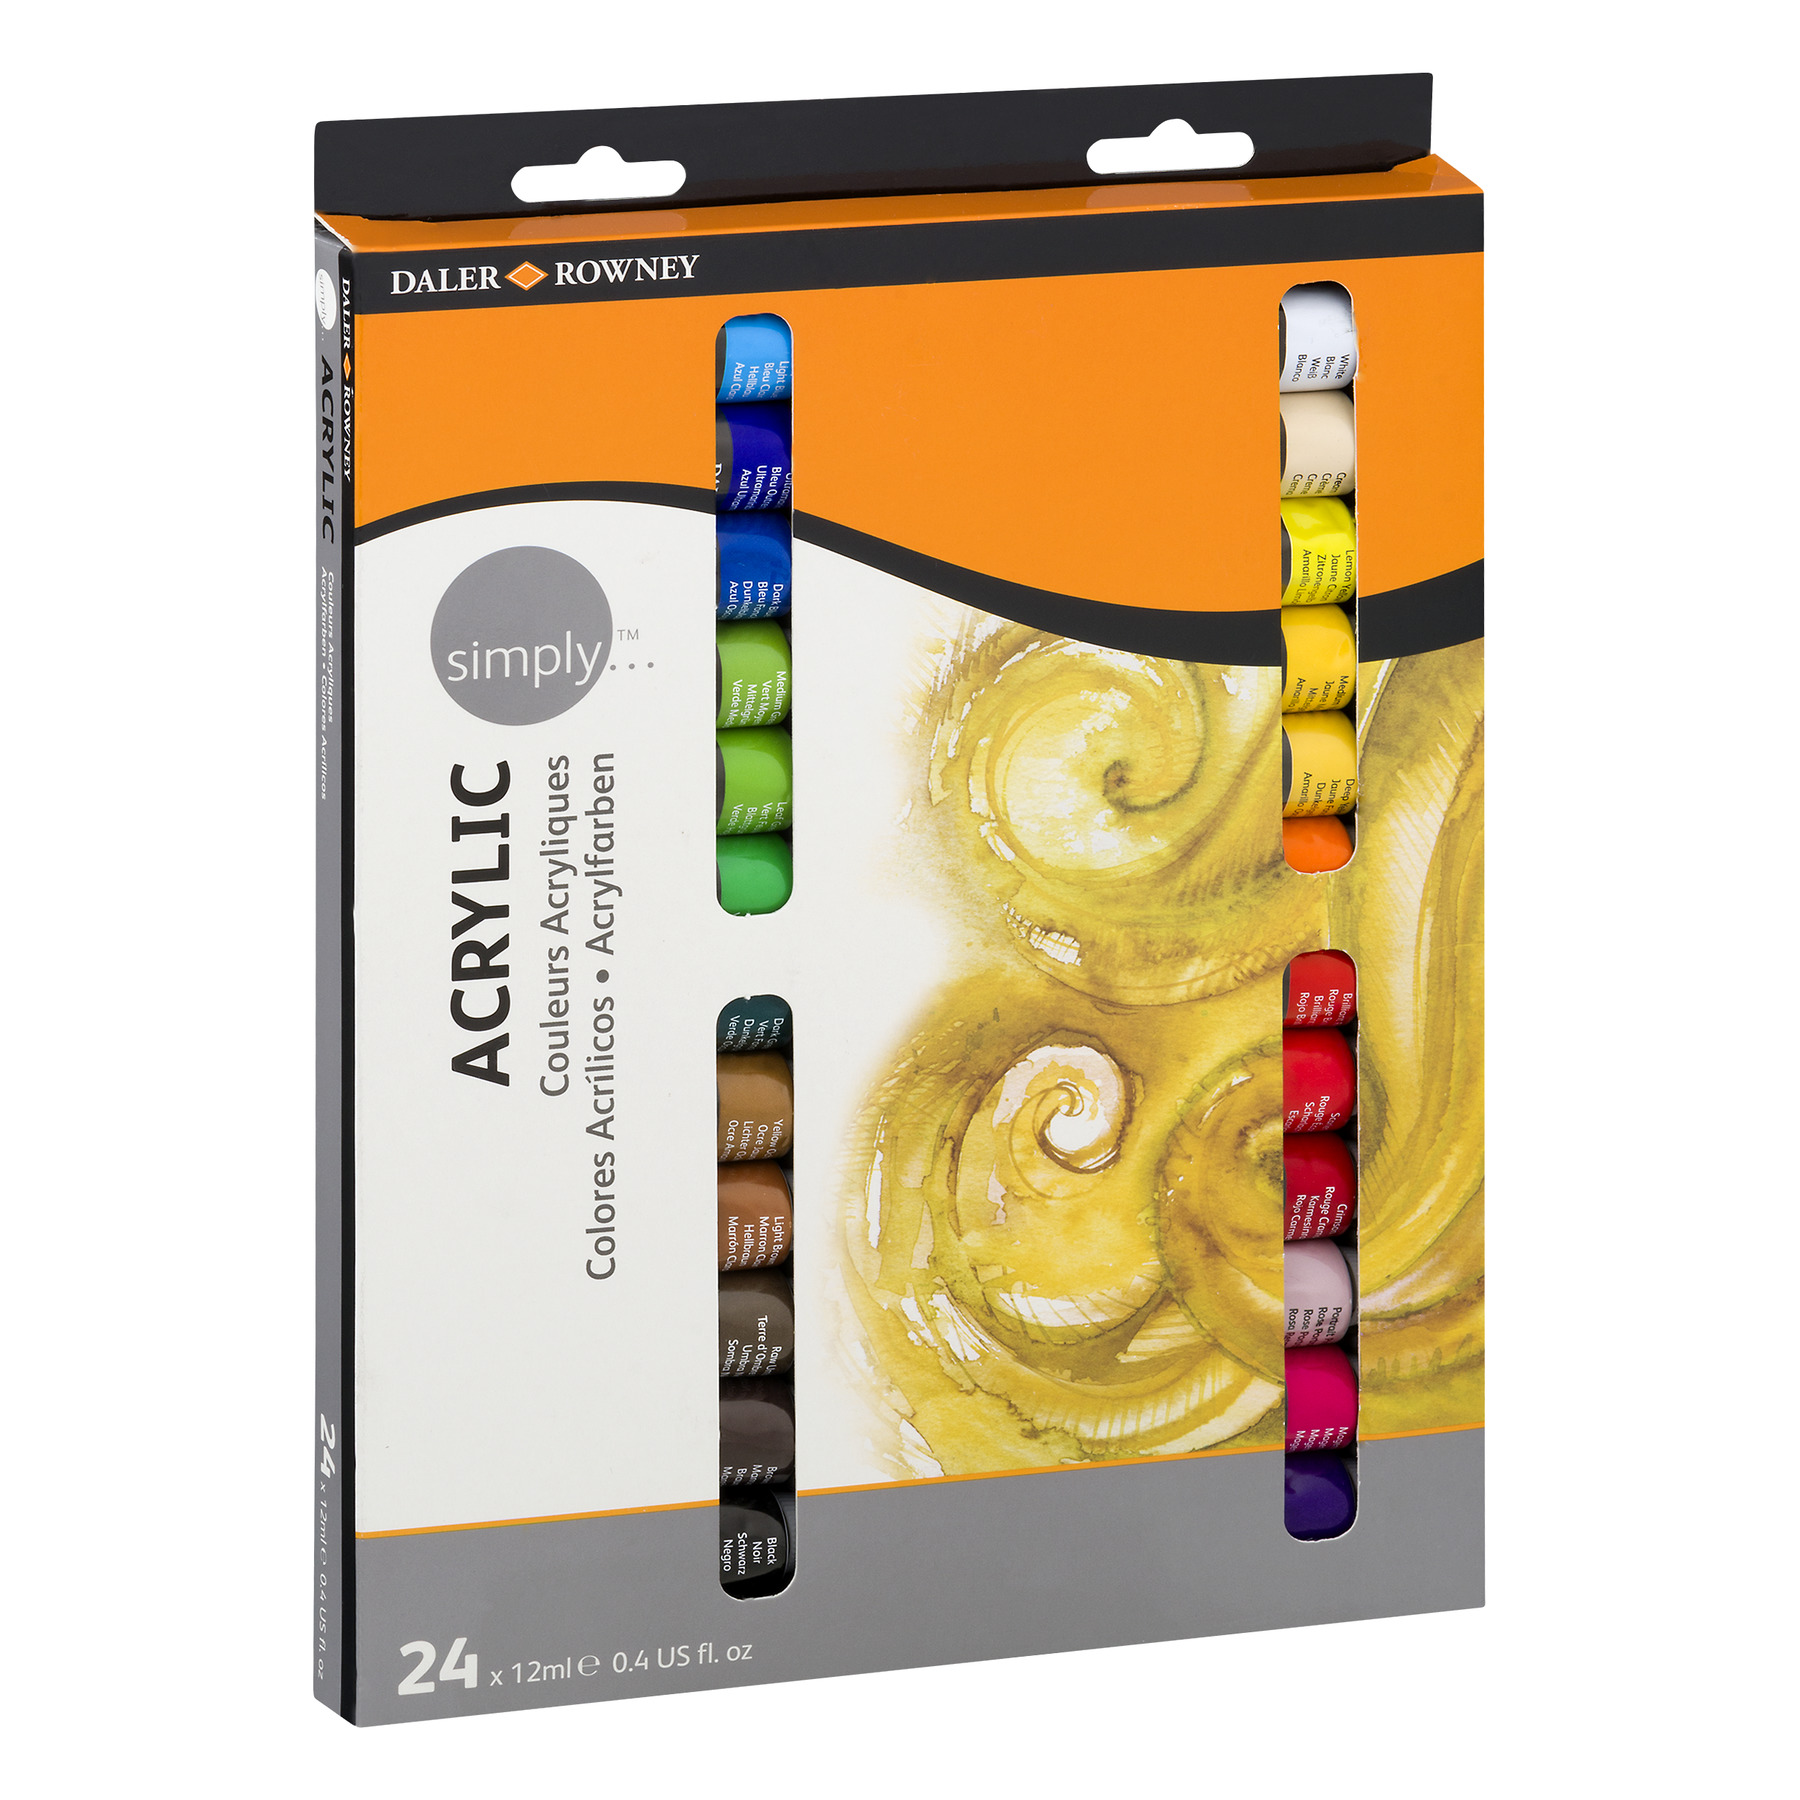 Daler - Rowney Simply Acrylic Paints - 24 CT0.4 FL OZ - Walmart.com